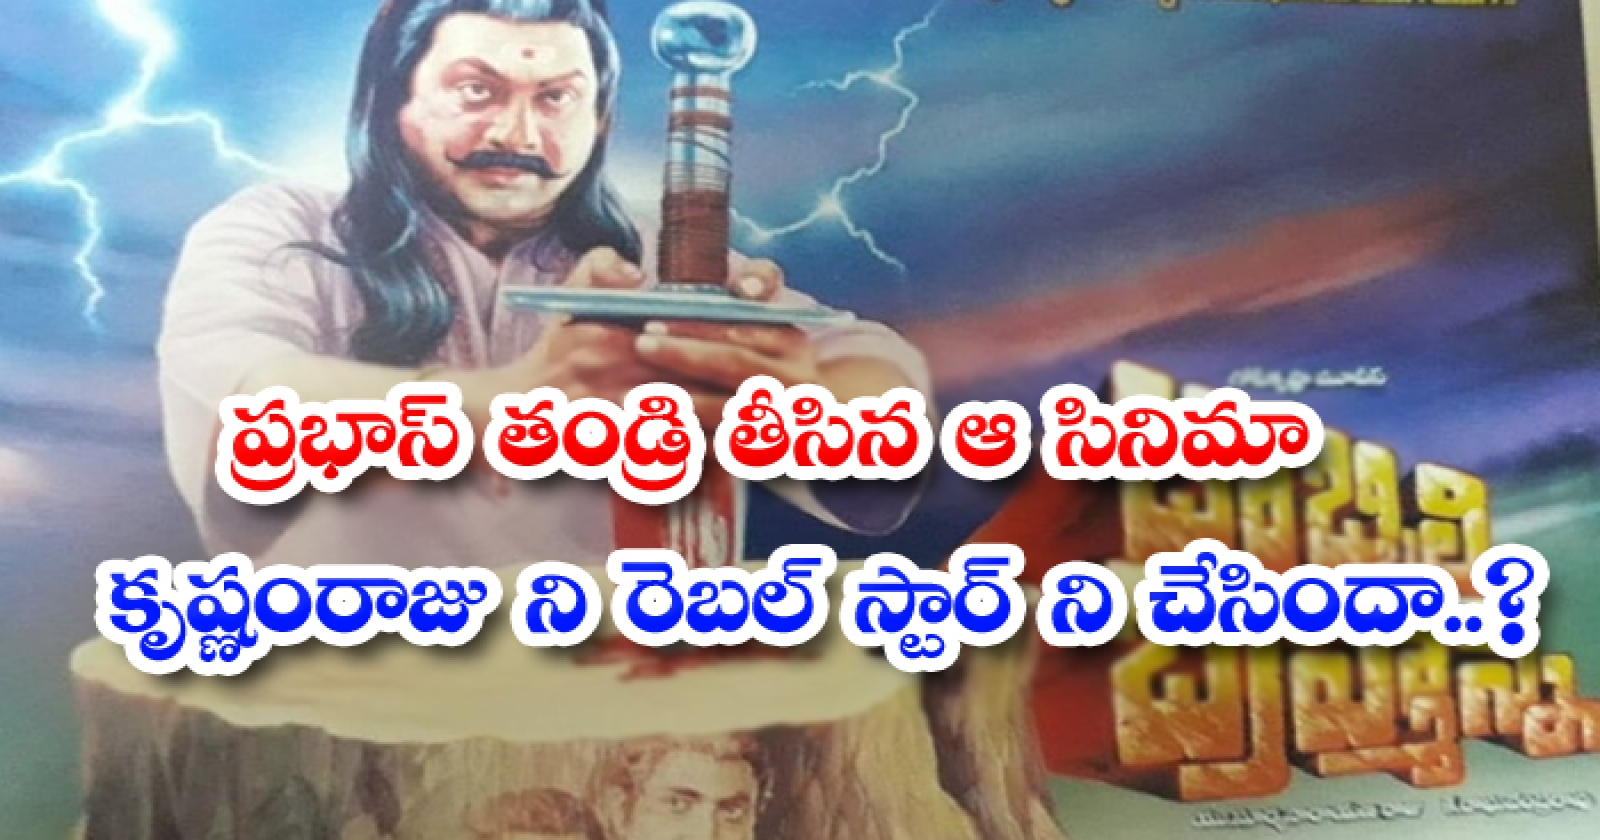 Unknown Facts About Prabhas Father Movie-ప్రభాస్ తండ్రి తీసిన ఆ సినిమా కృష్ణం రాజు ని రెబల్ స్టార్ ని చేసిందా..-Latest News - Telugu-Telugu Tollywood Photo Image-TeluguStop.com